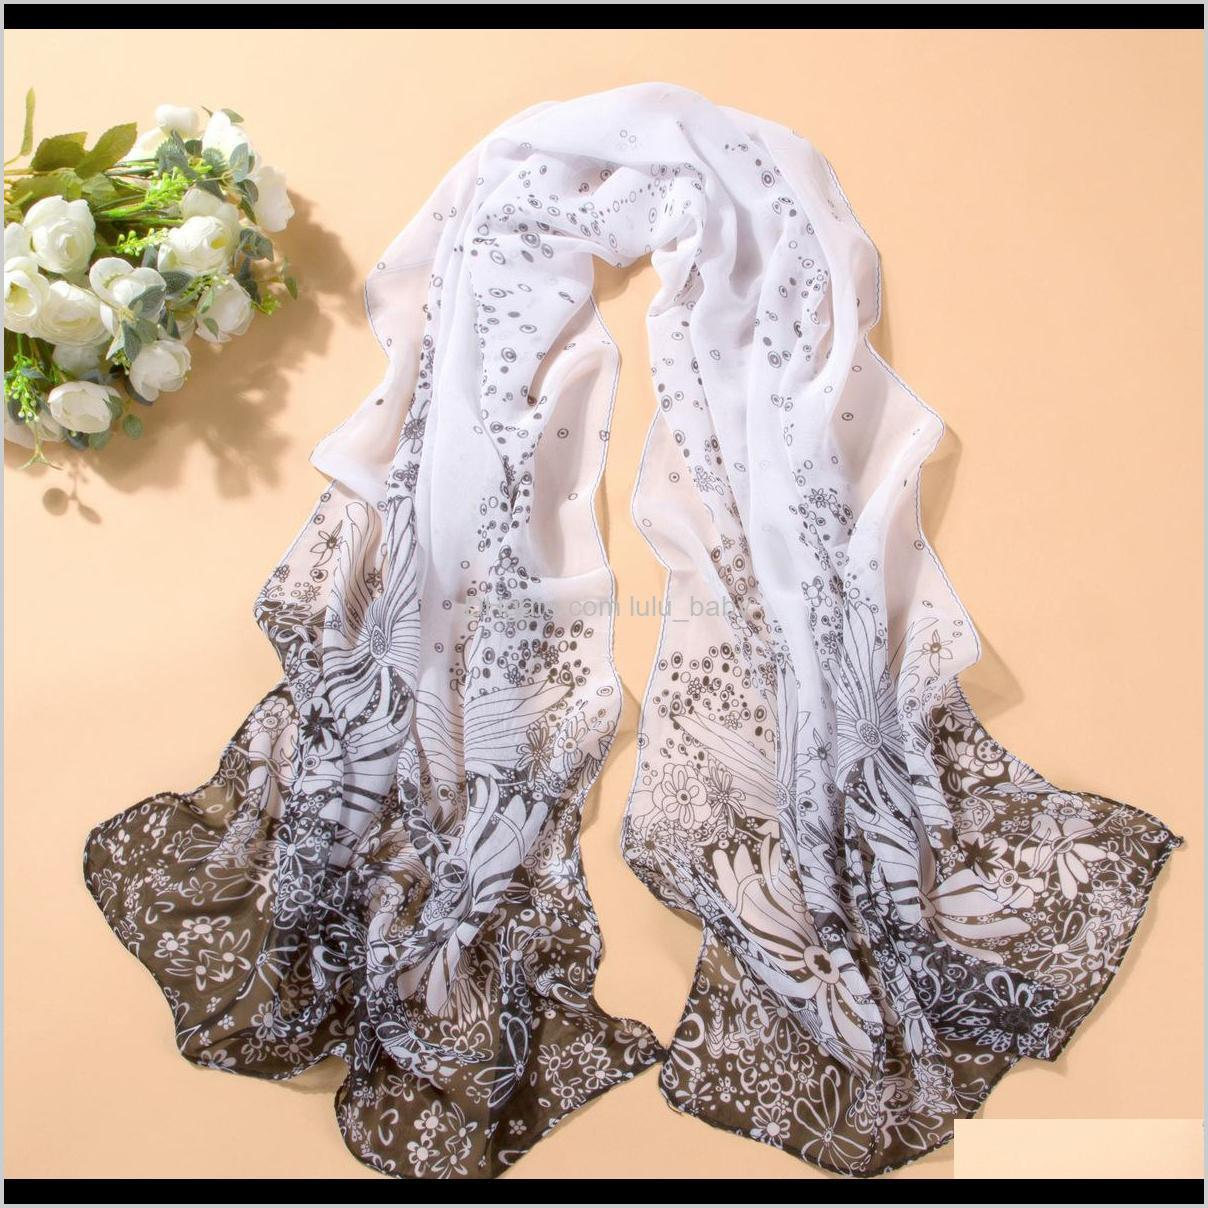 2016 new scarf summer pashmina women`s scarf long shawl printed cape silk chiffon tippet muffler echarpes scarves dht155